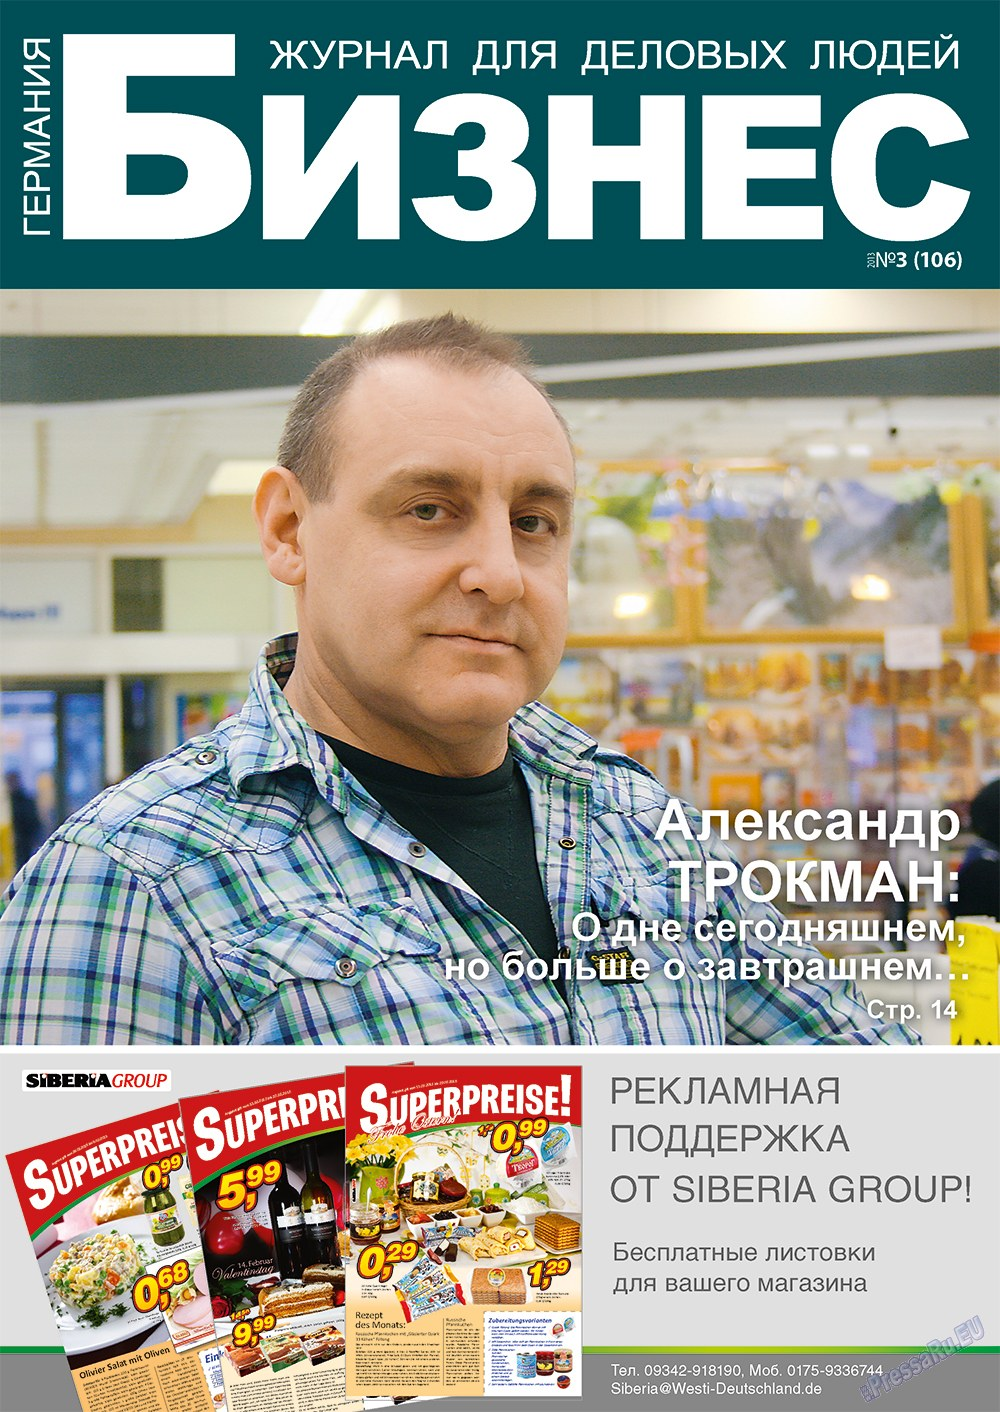 Бизнес (журнал). 2013 год, номер 3, стр. 1